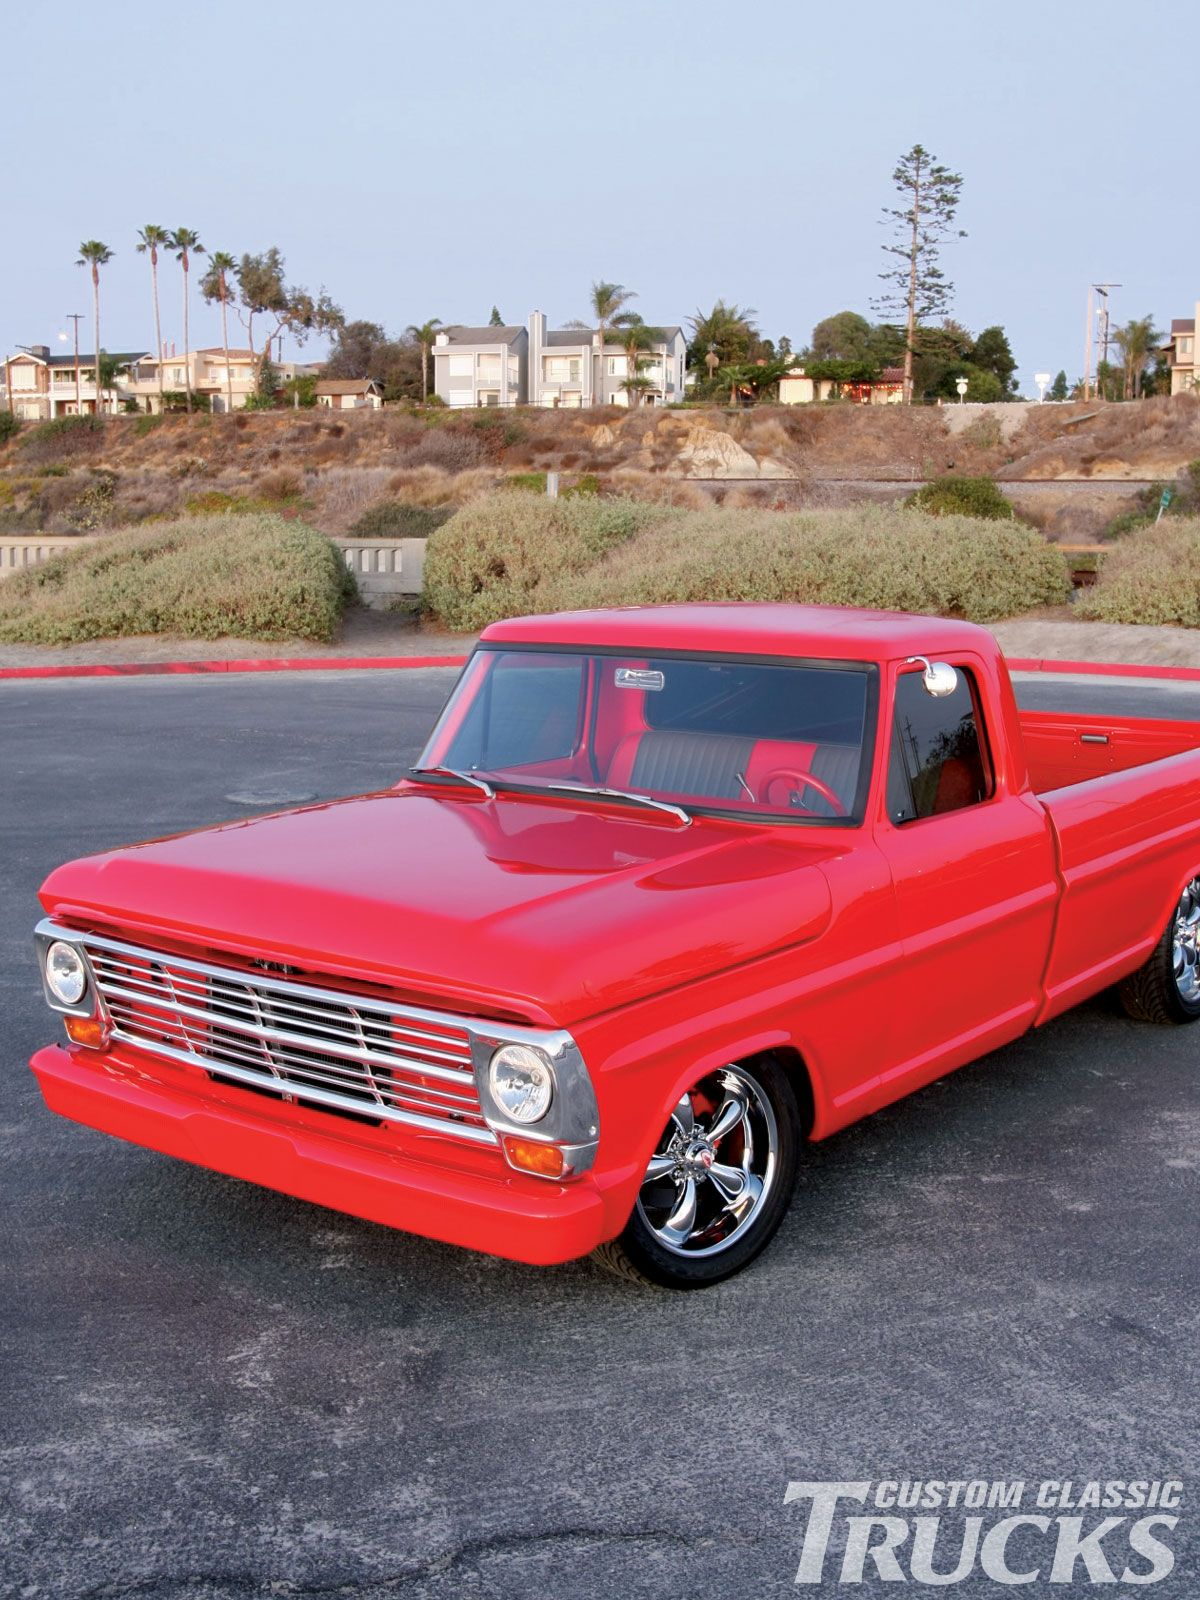 vintage Ford truck   Trucks n such   Pinterest   Ford trucks, Ford ...